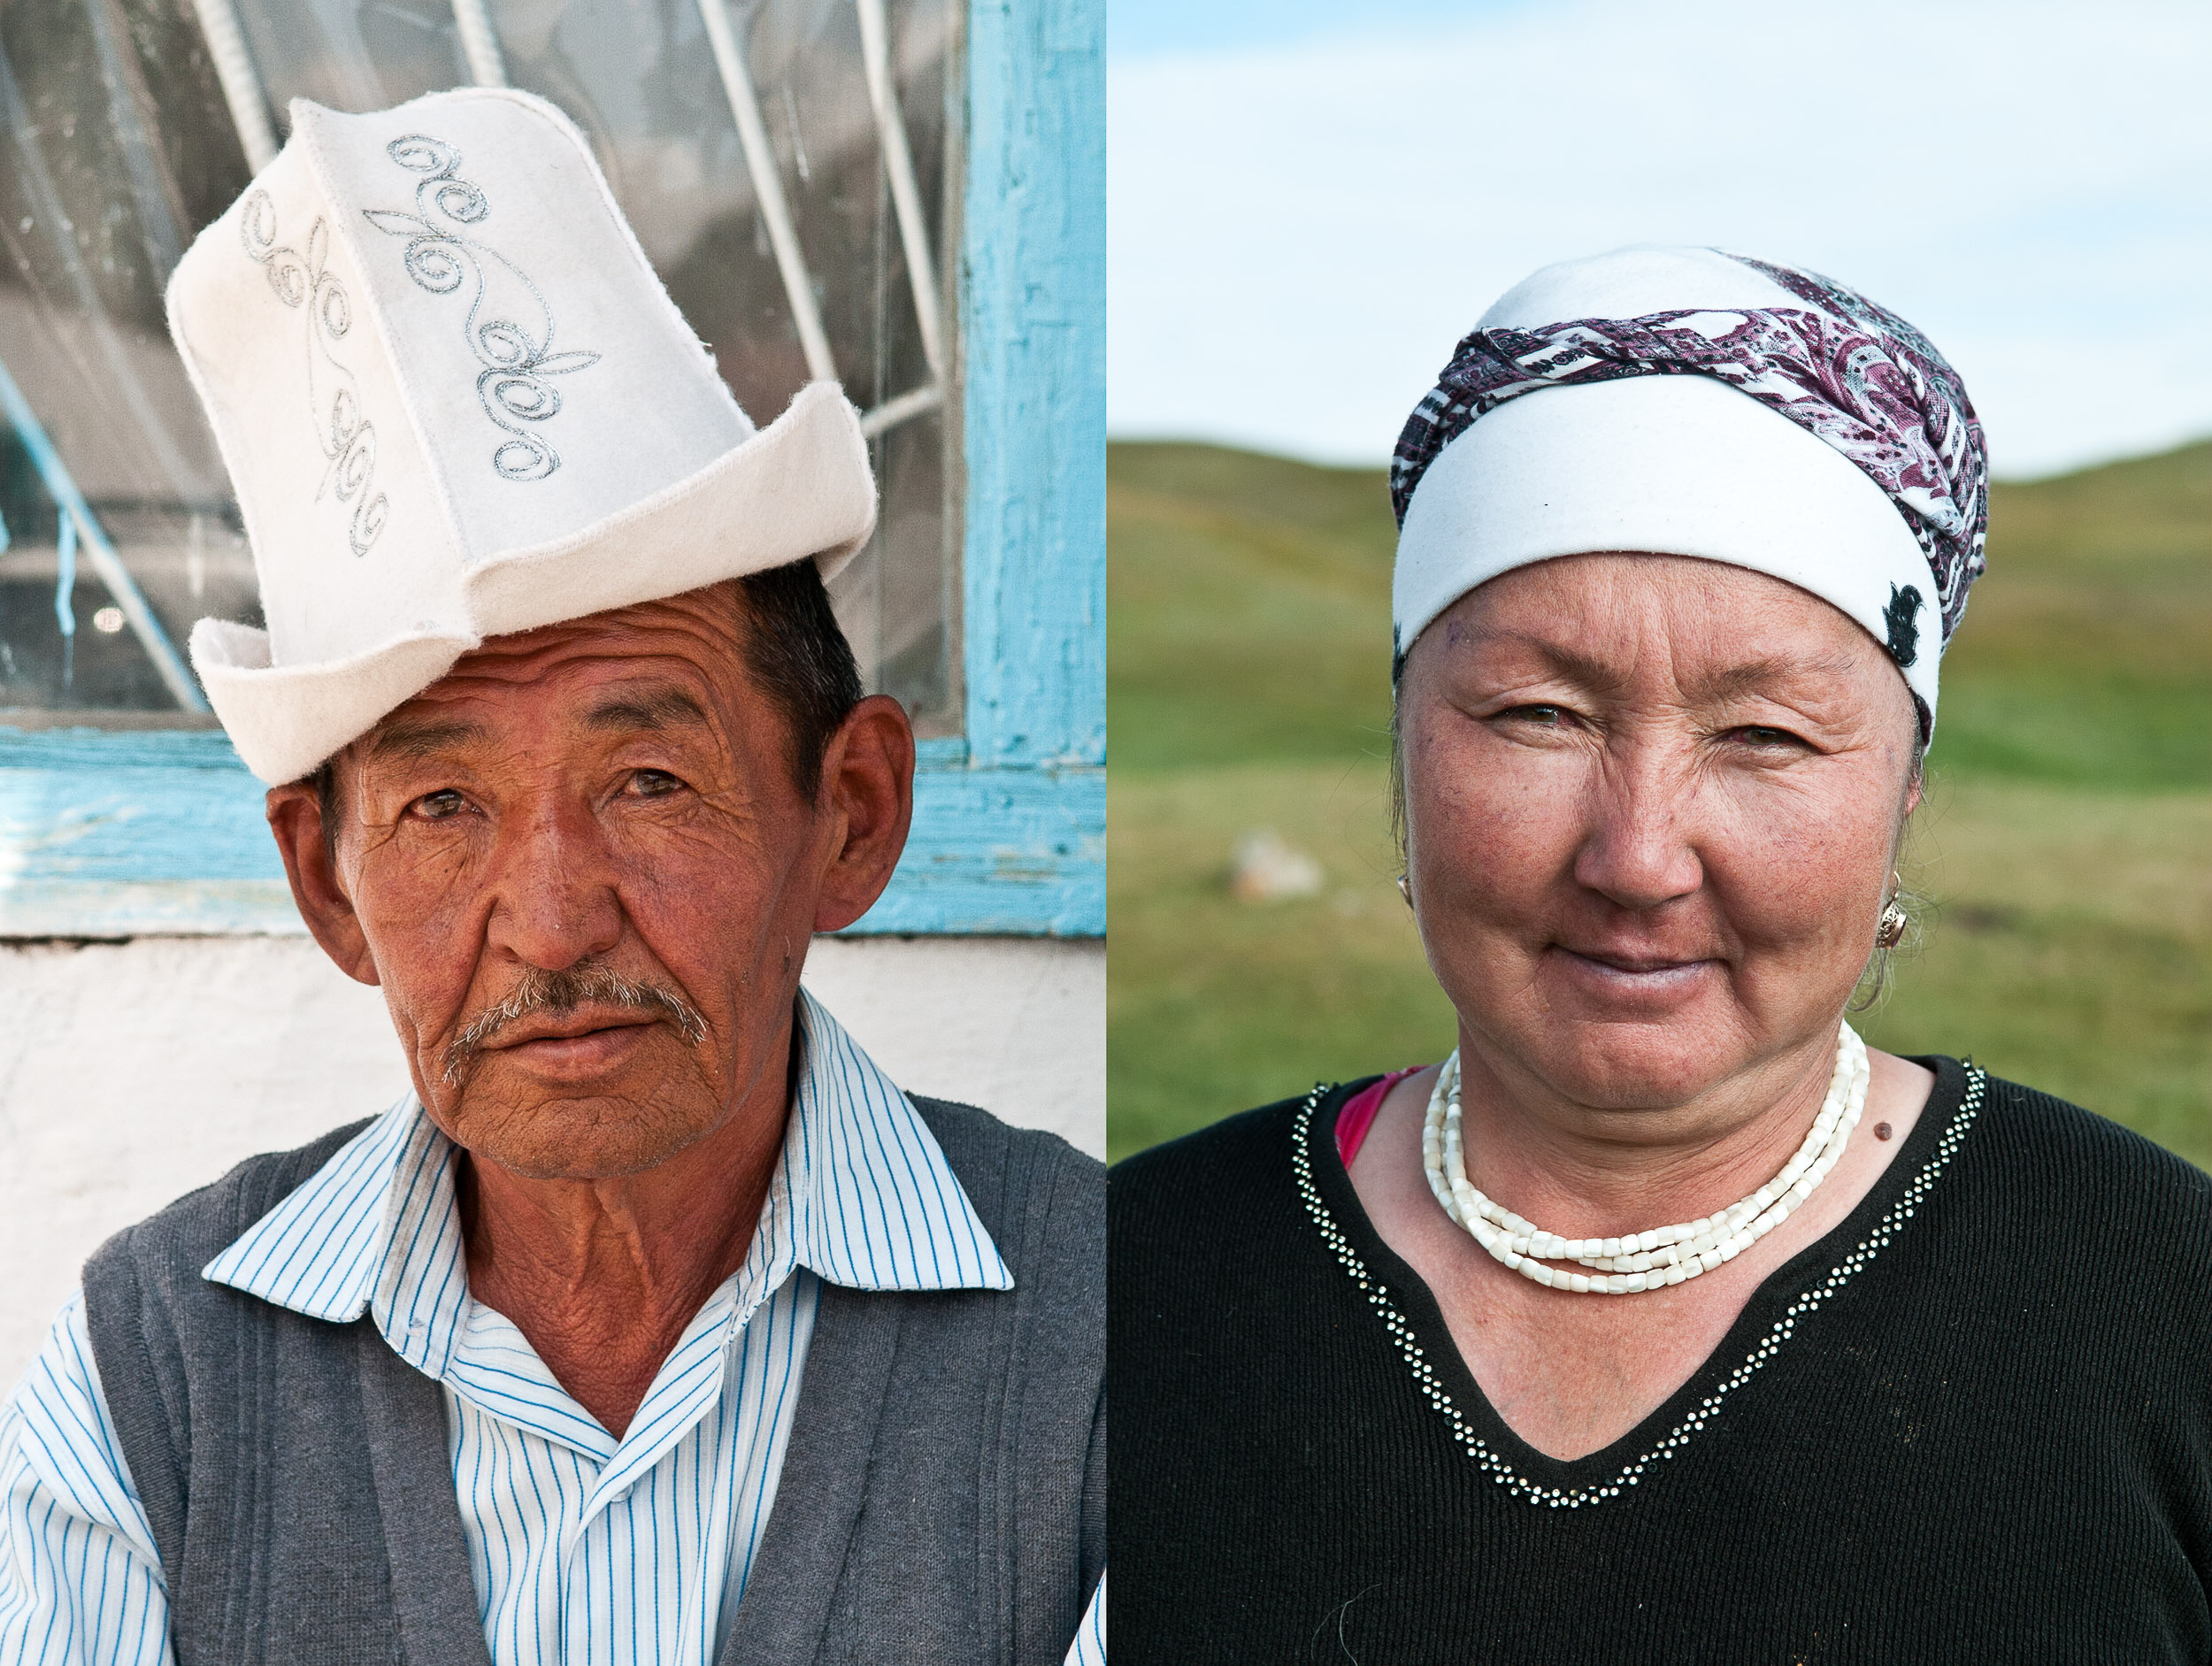 Portrait of a woman, Kyrgyzstan.